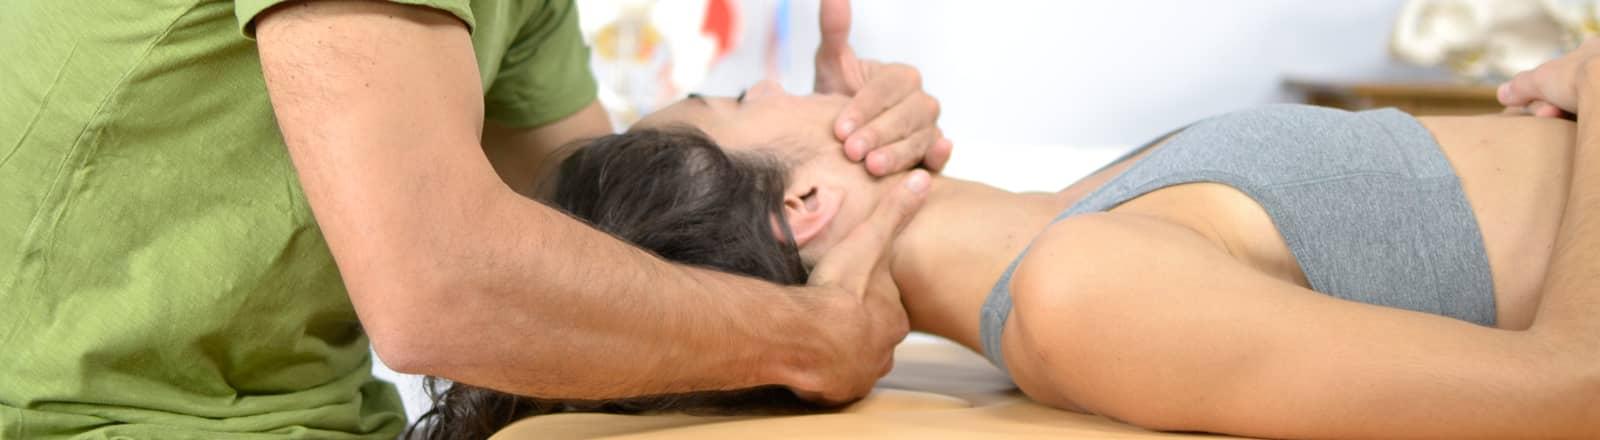 fisioterapia visceral Bilbao